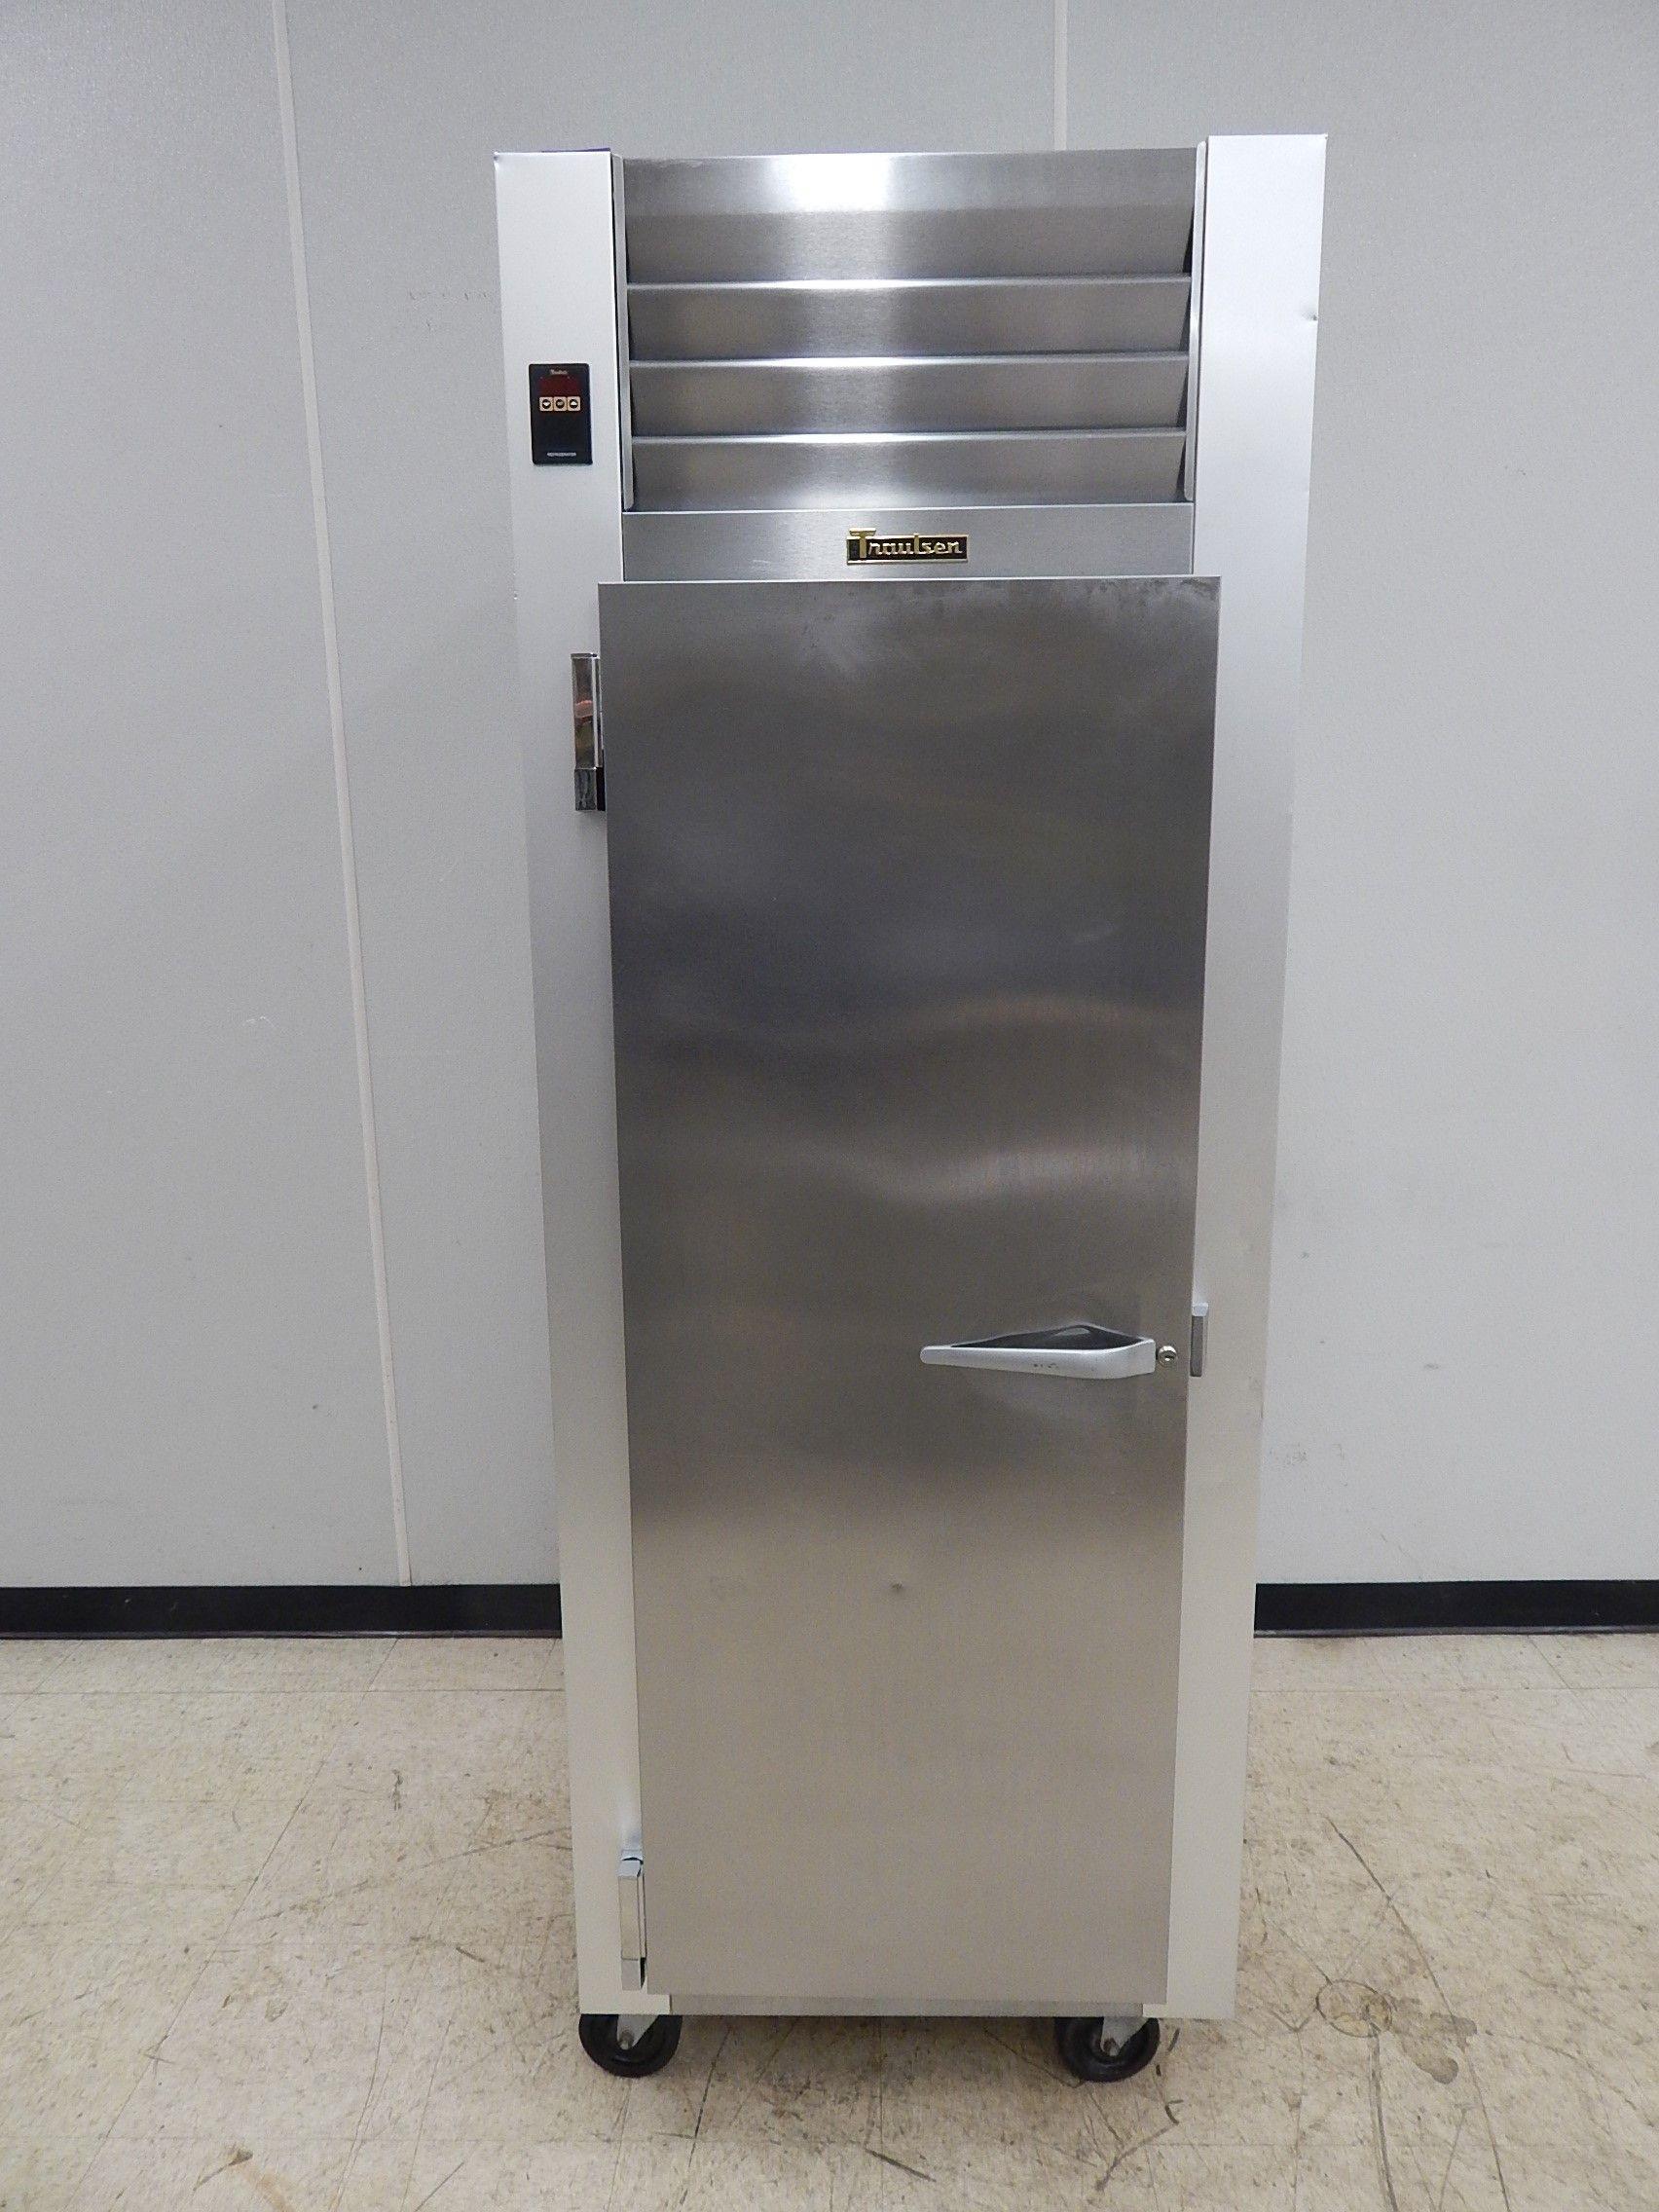 Details About Traulsen One Door Refrigerator, Model G10011